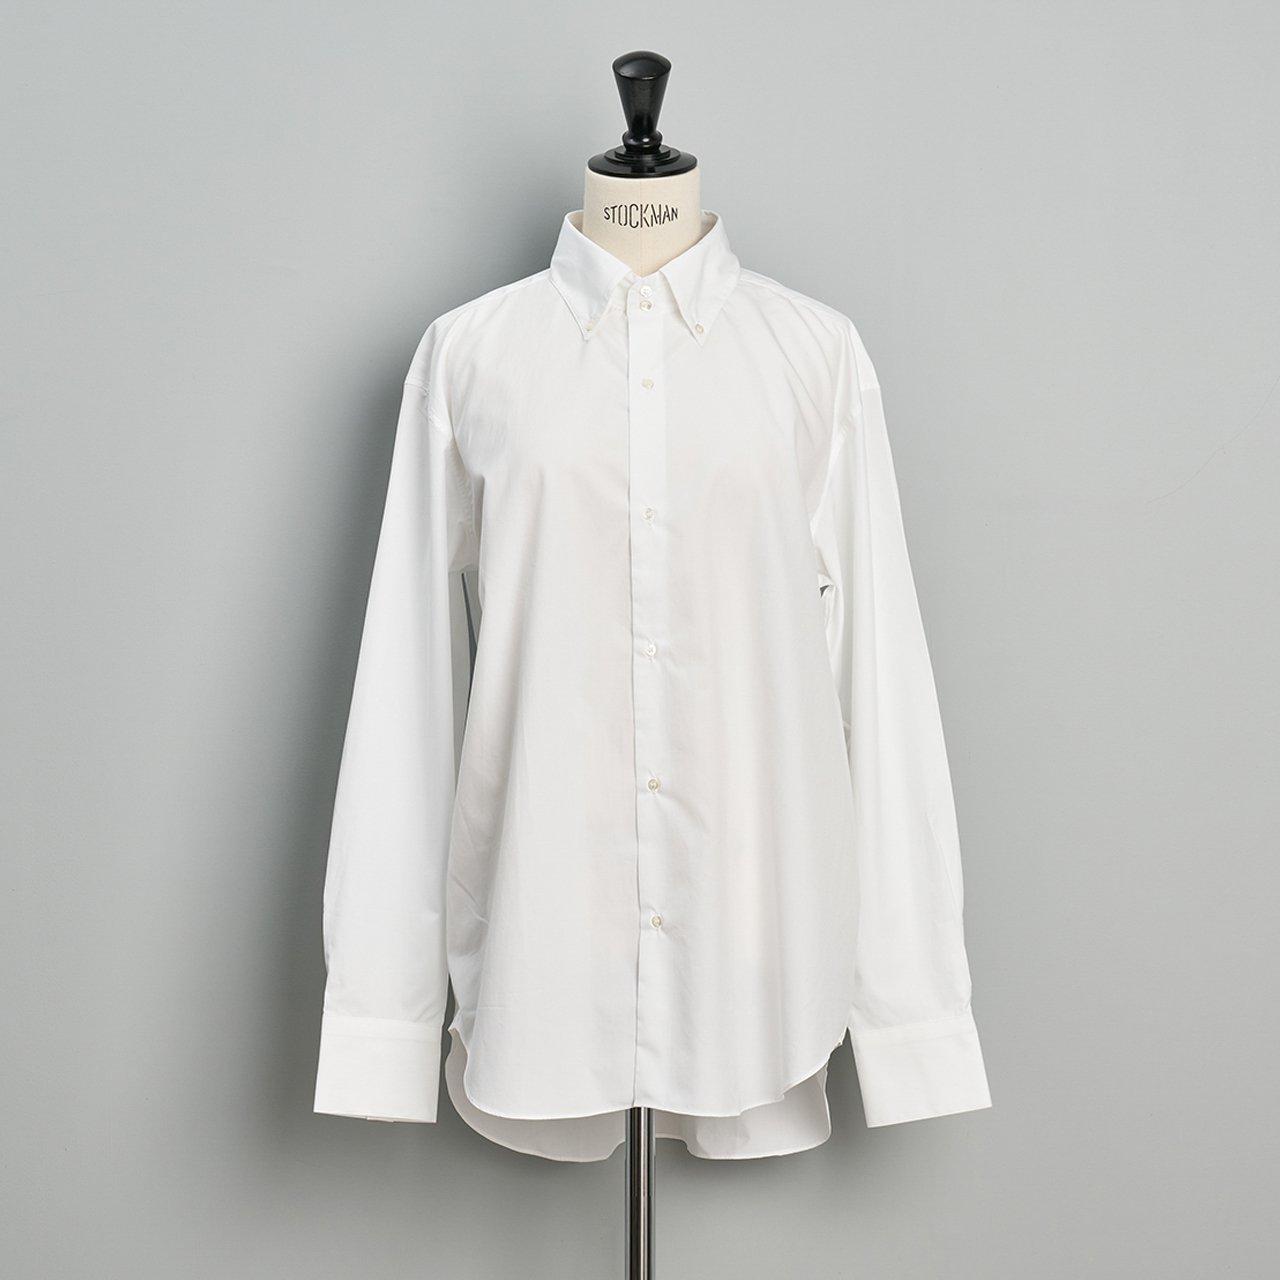 seya.<BR>Kashmir button down shirt<BR>white